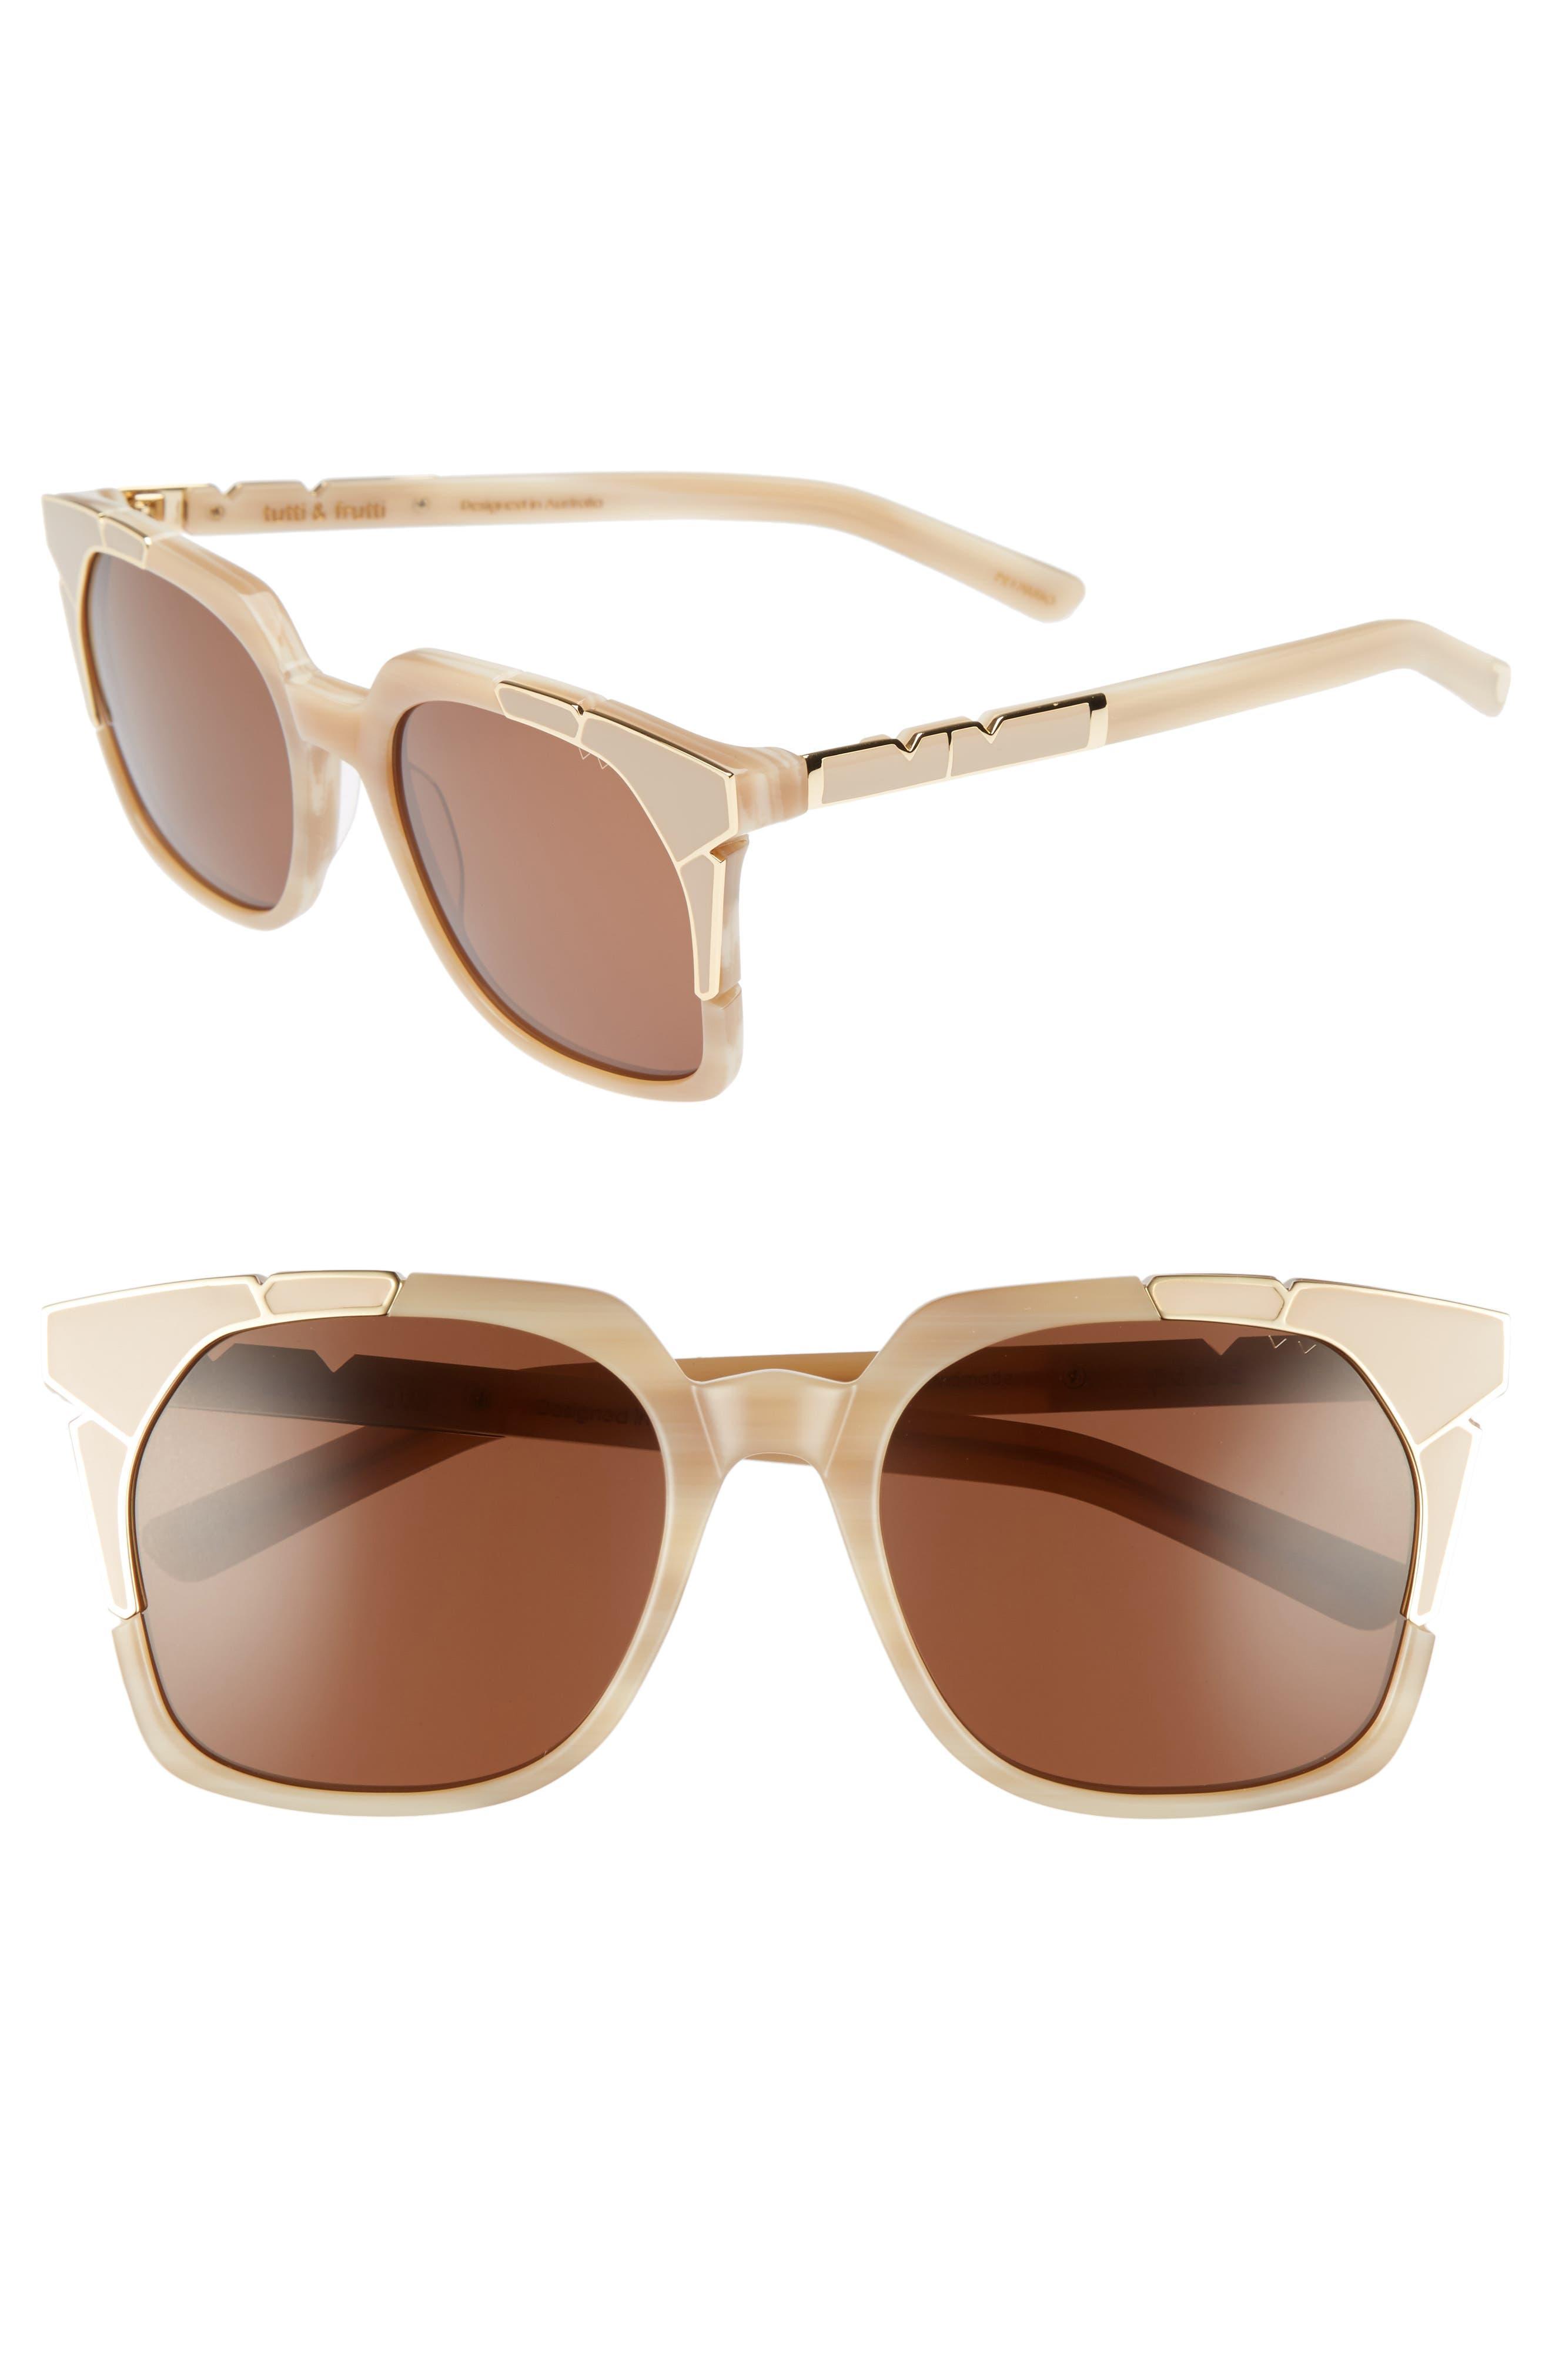 Pared Tutti & Frutti 55mm Sunglasses